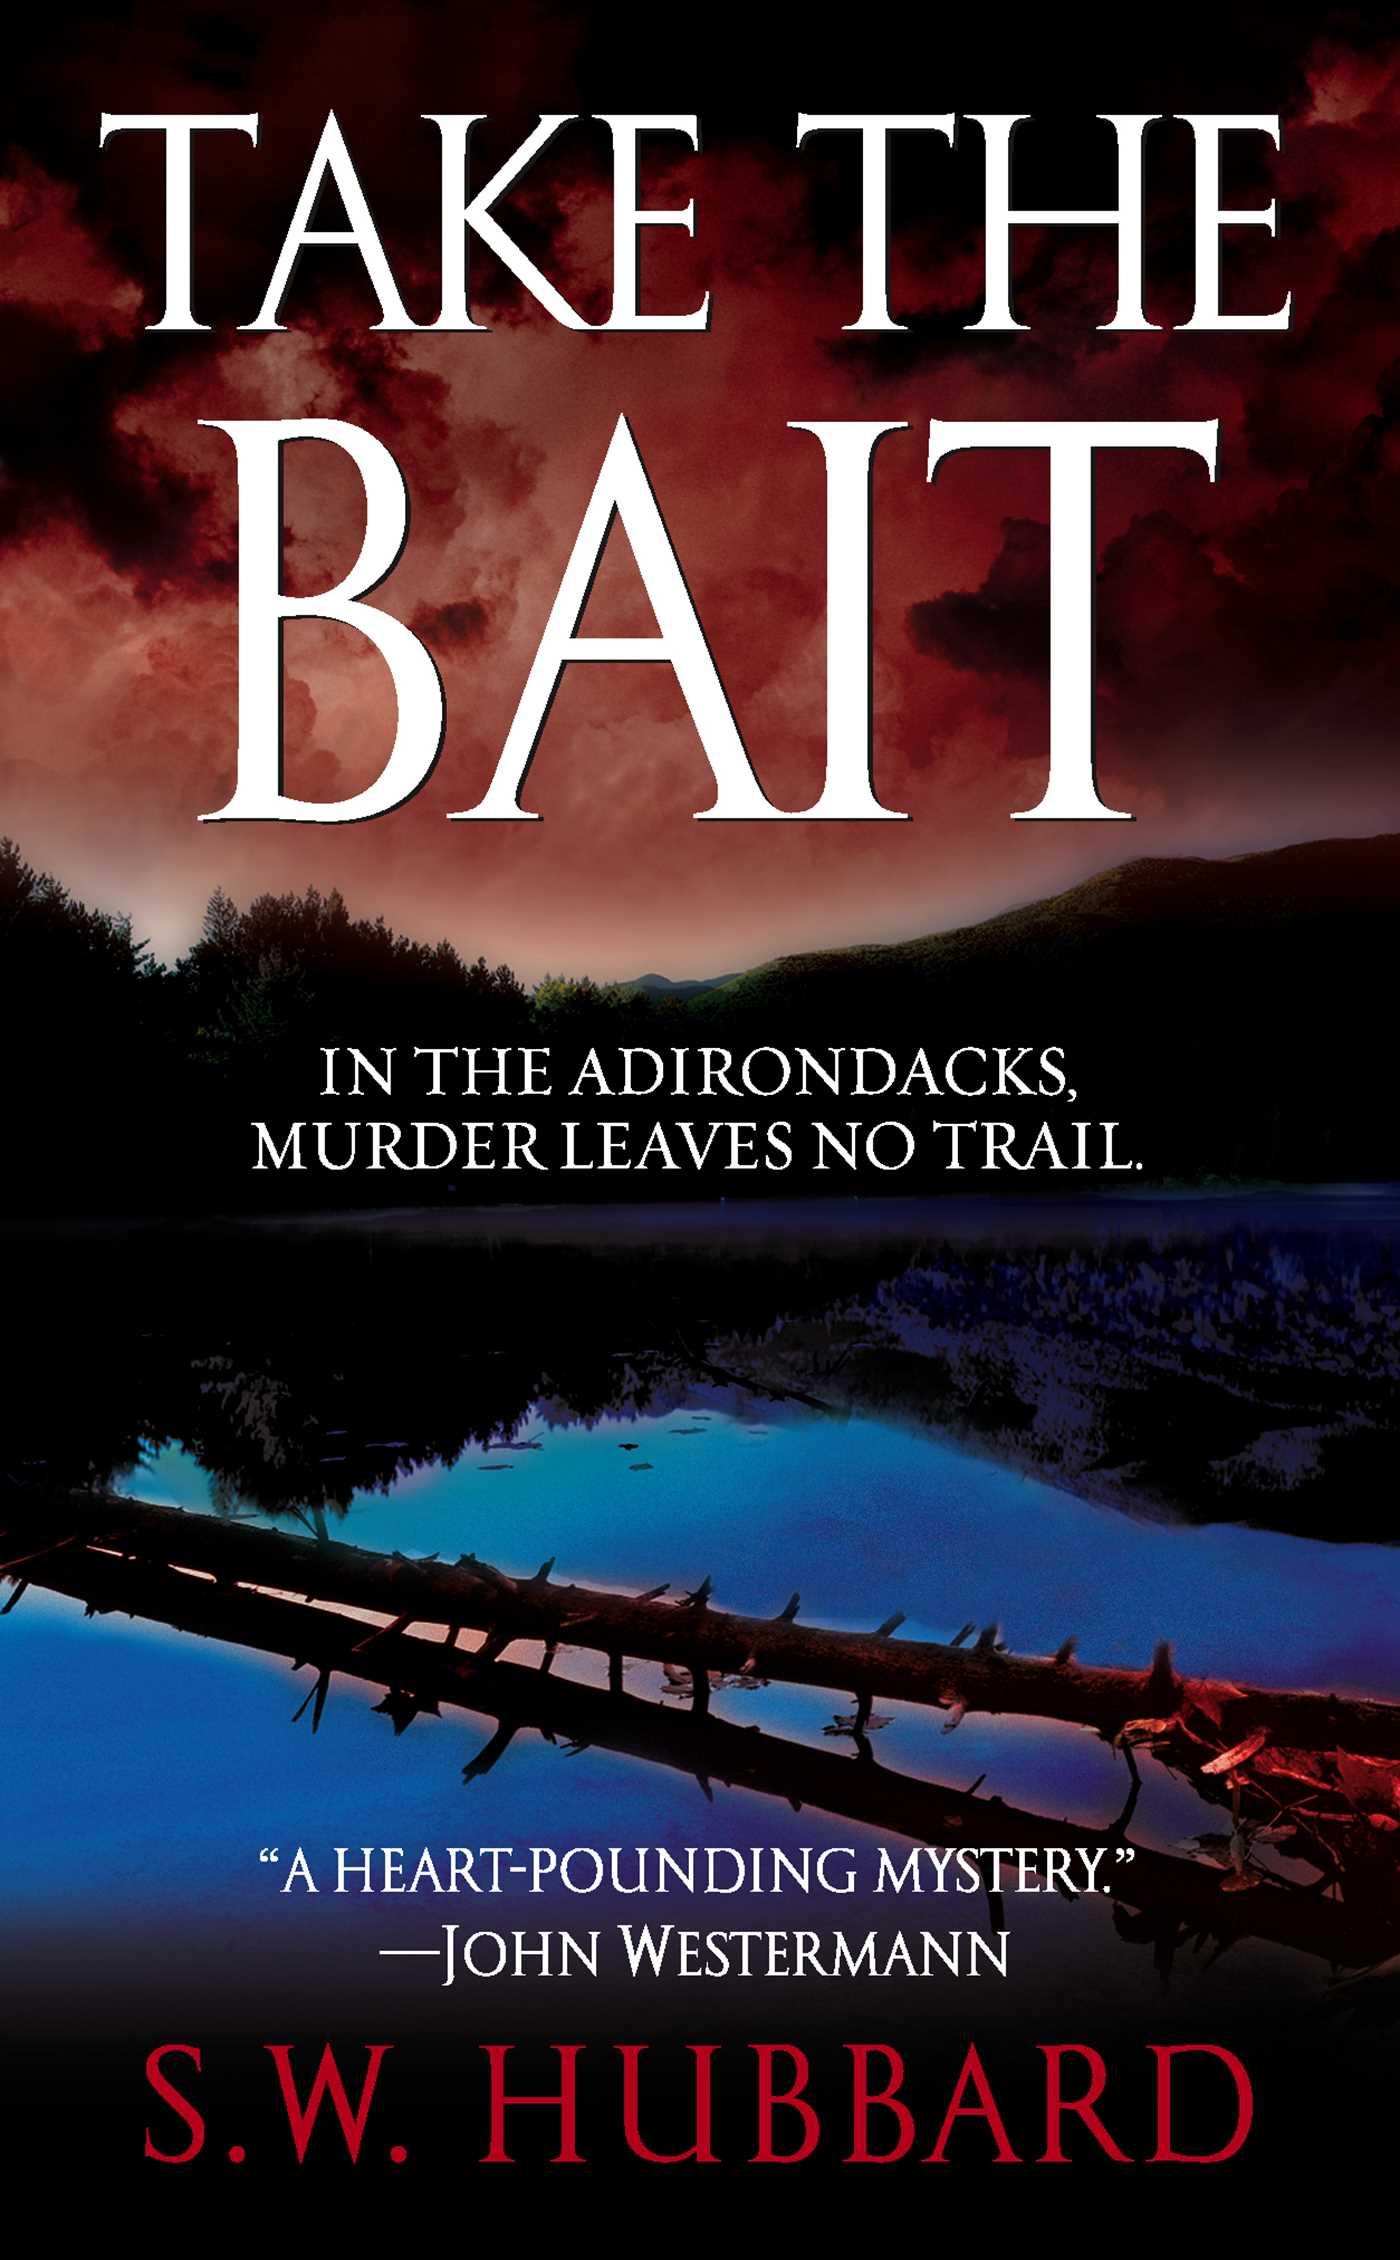 Take the bait 9780743480765 hr